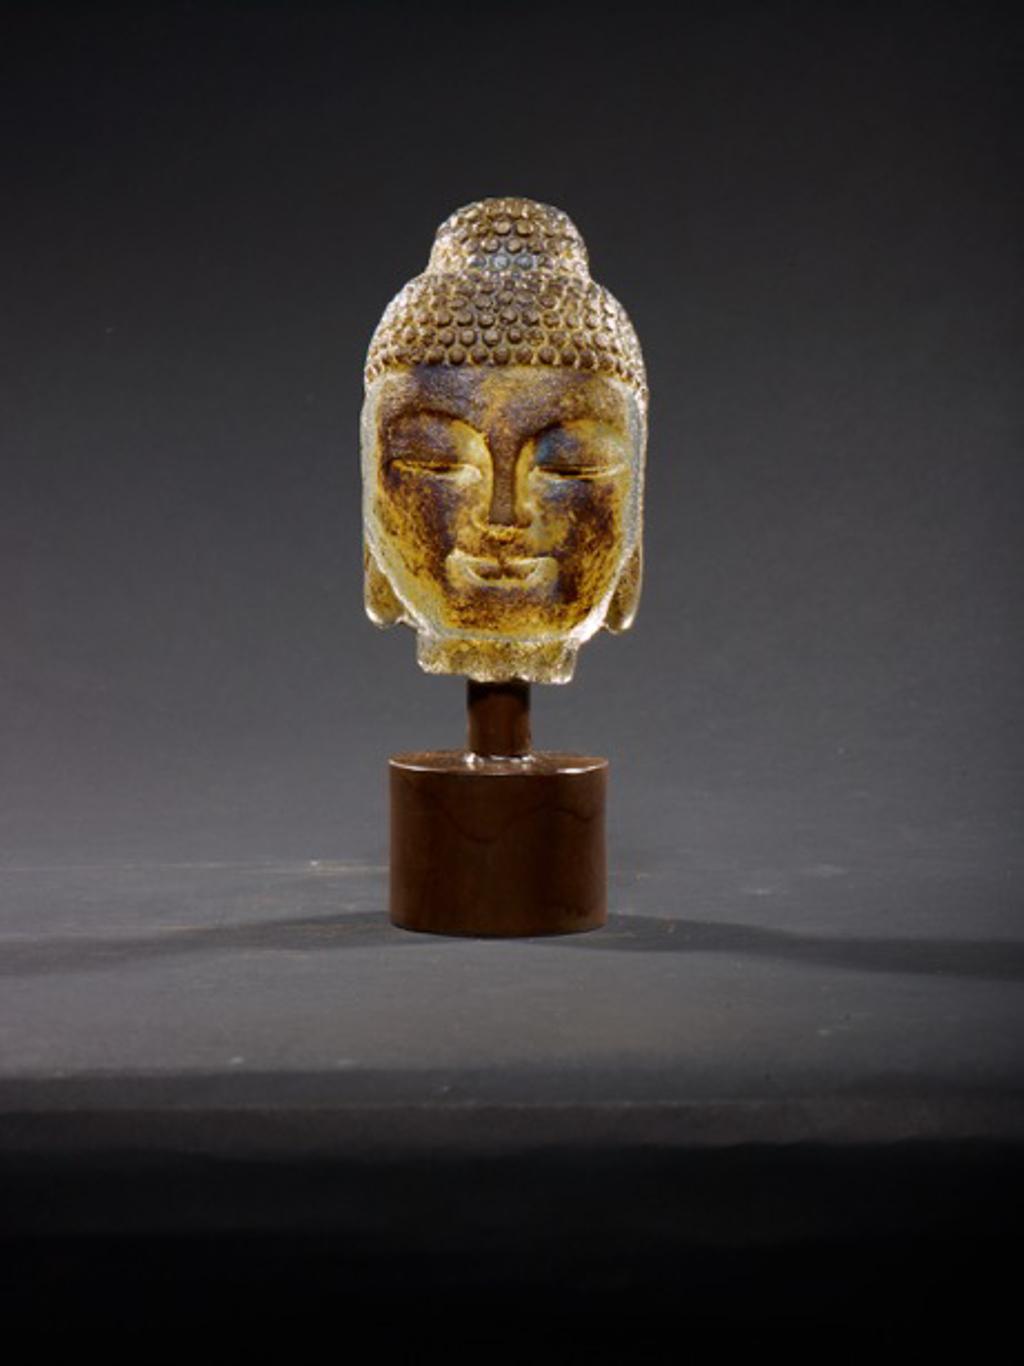 Mini Buddha - Metallic by Marlene Rose (b. 1967)